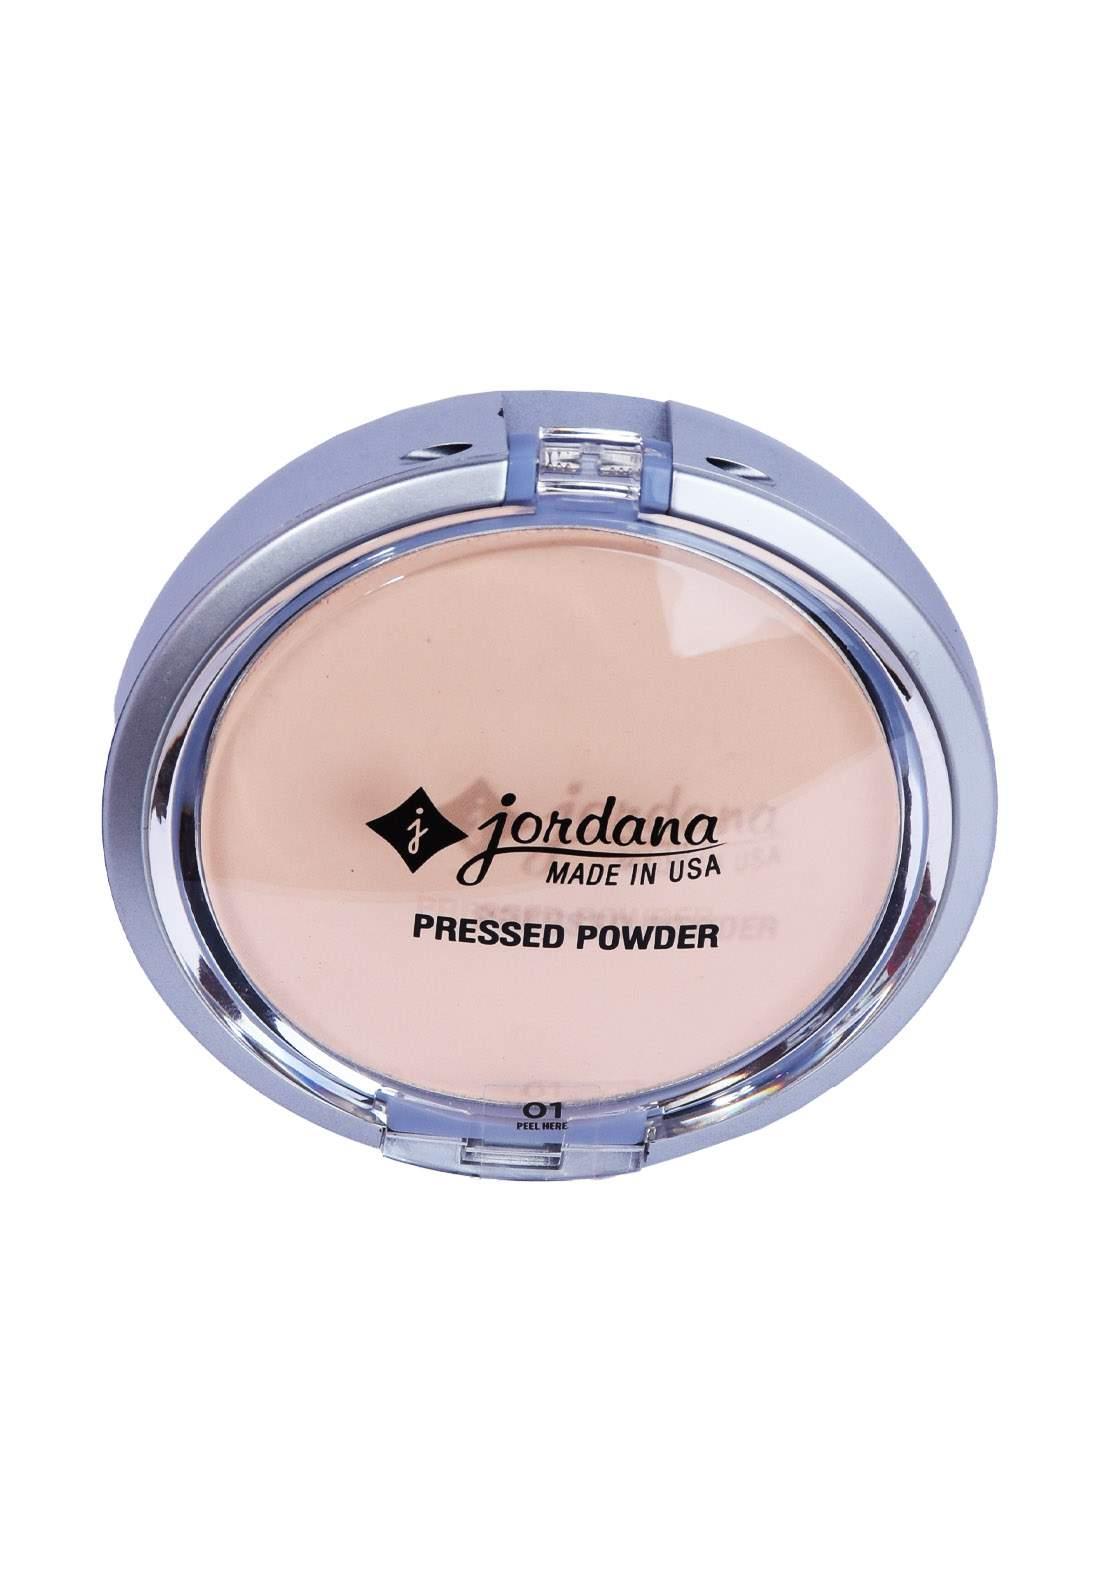 Jordana Perfect Pressed Powder - 01 Natural Beige, 0.35 oz باودر مضغوط